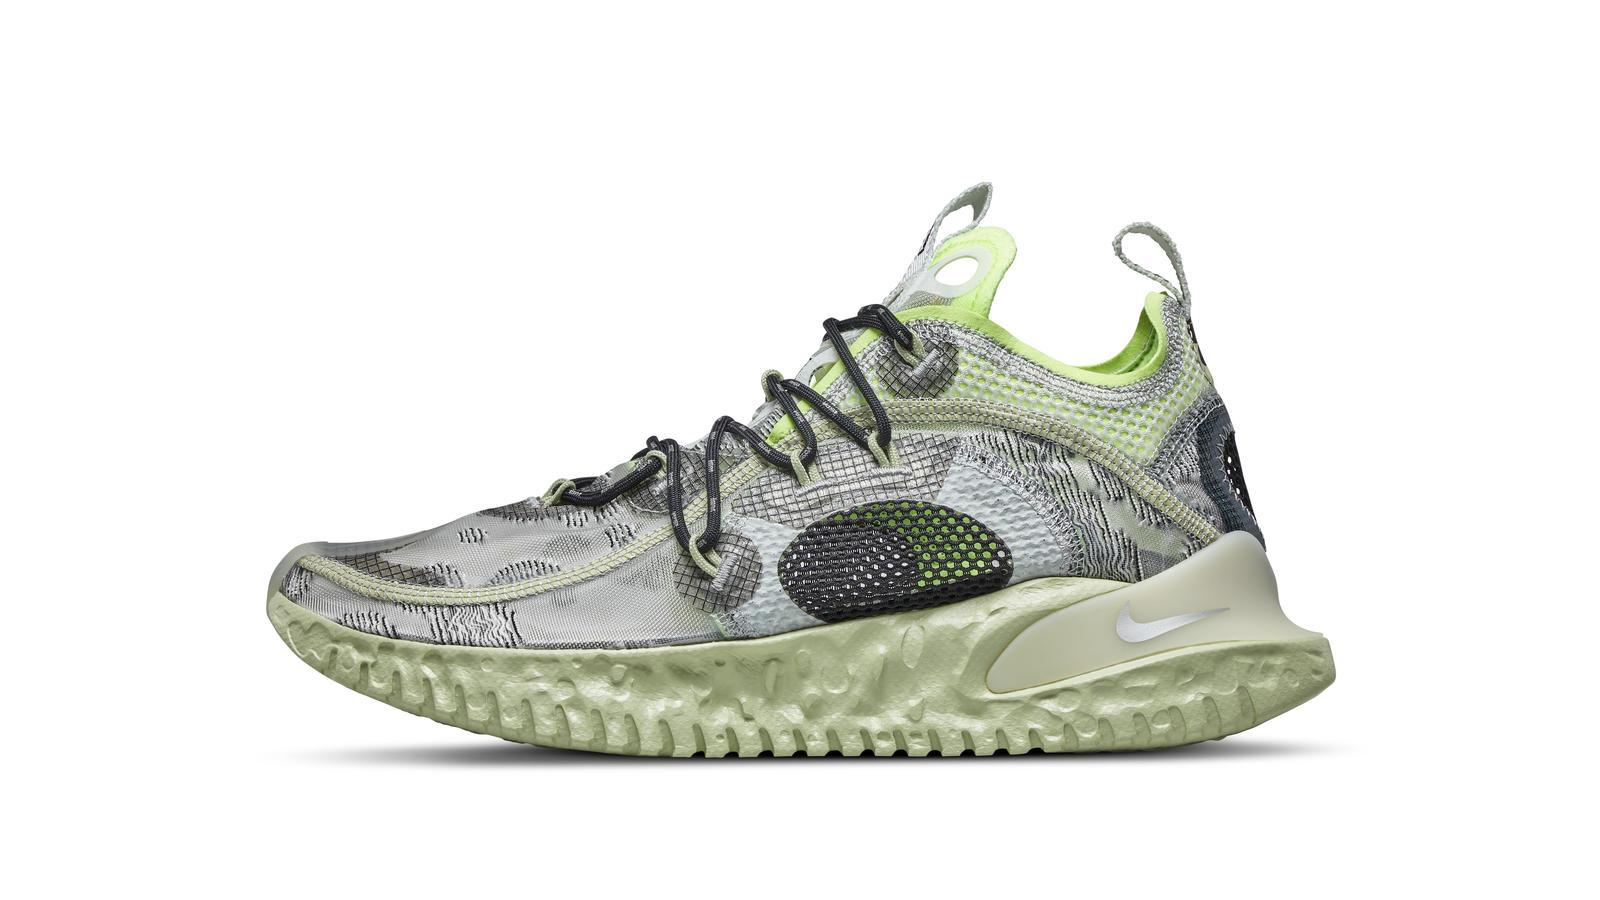 Nike ISPA 2020 Preview 19